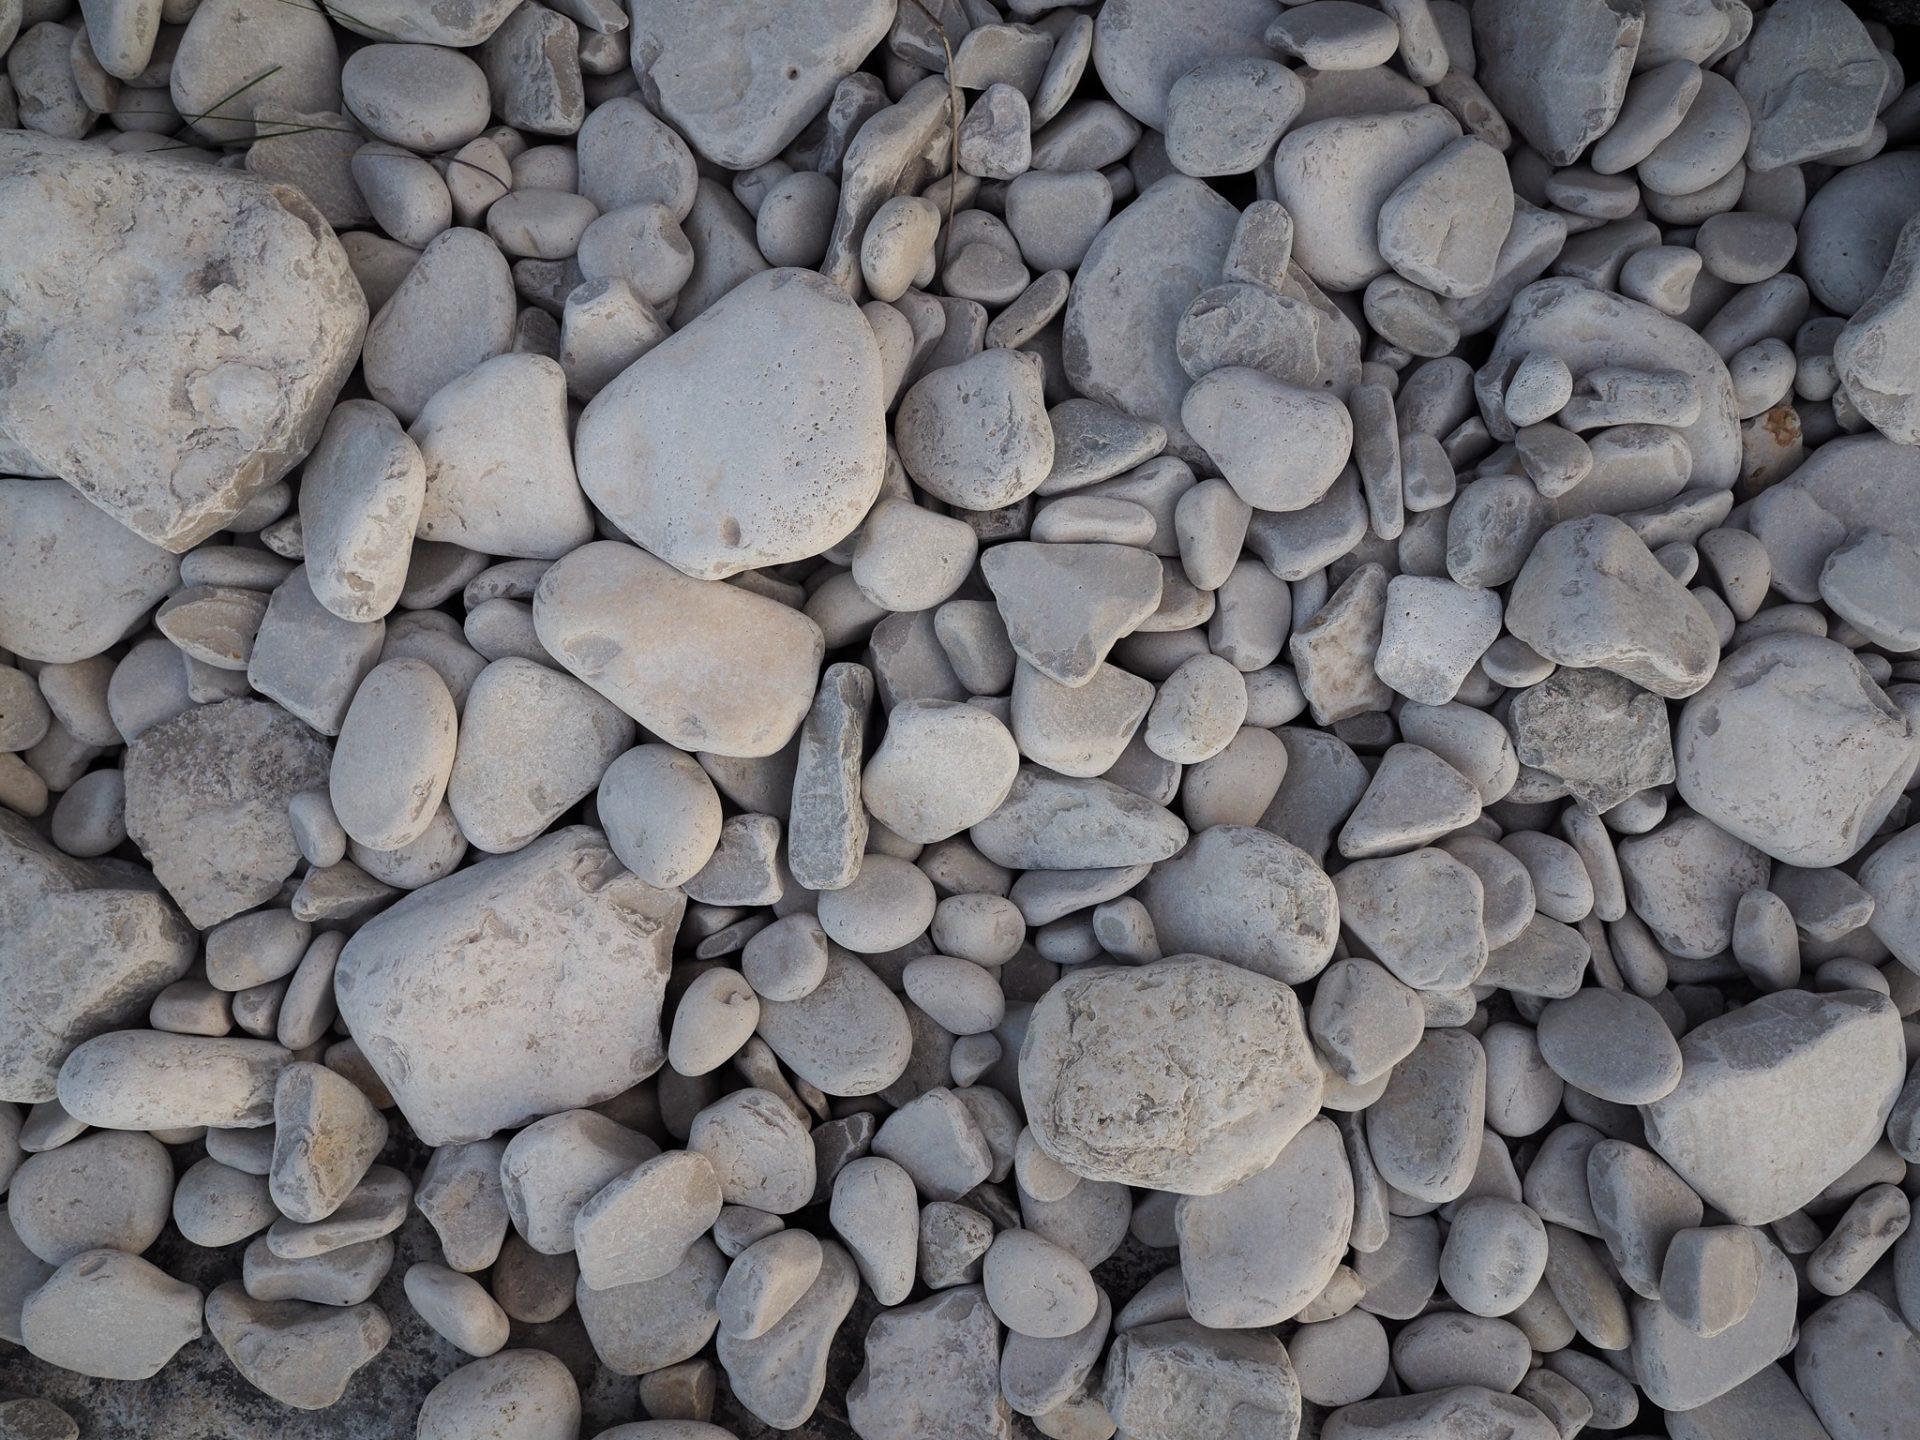 Bruce Peninsula Stormhaven Beach Pebbles